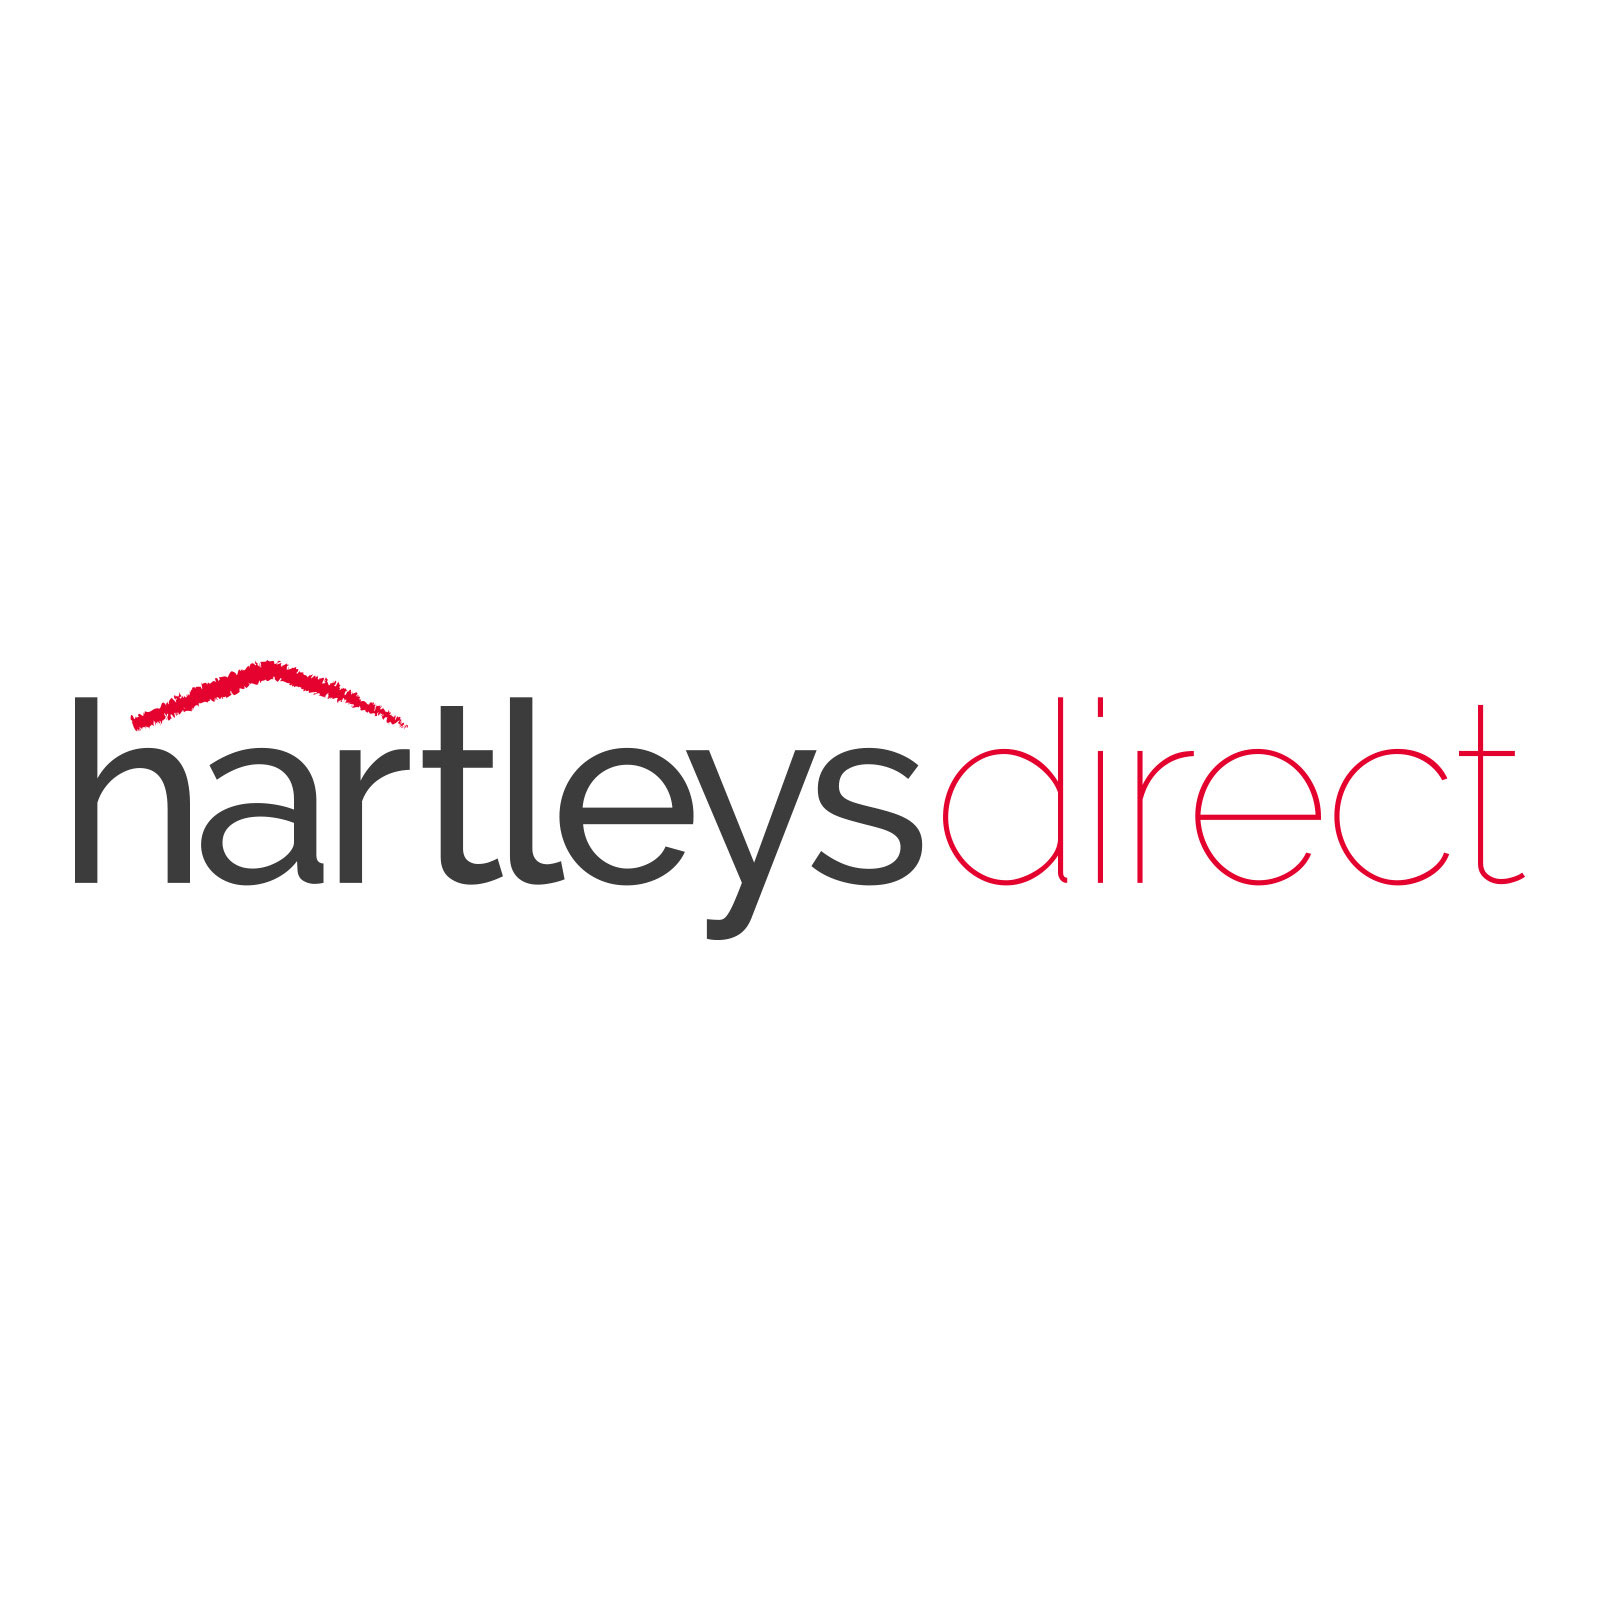 Hartleys-27-inch-Aluminium-Office-Chair-Base-on-White-Background.jpg